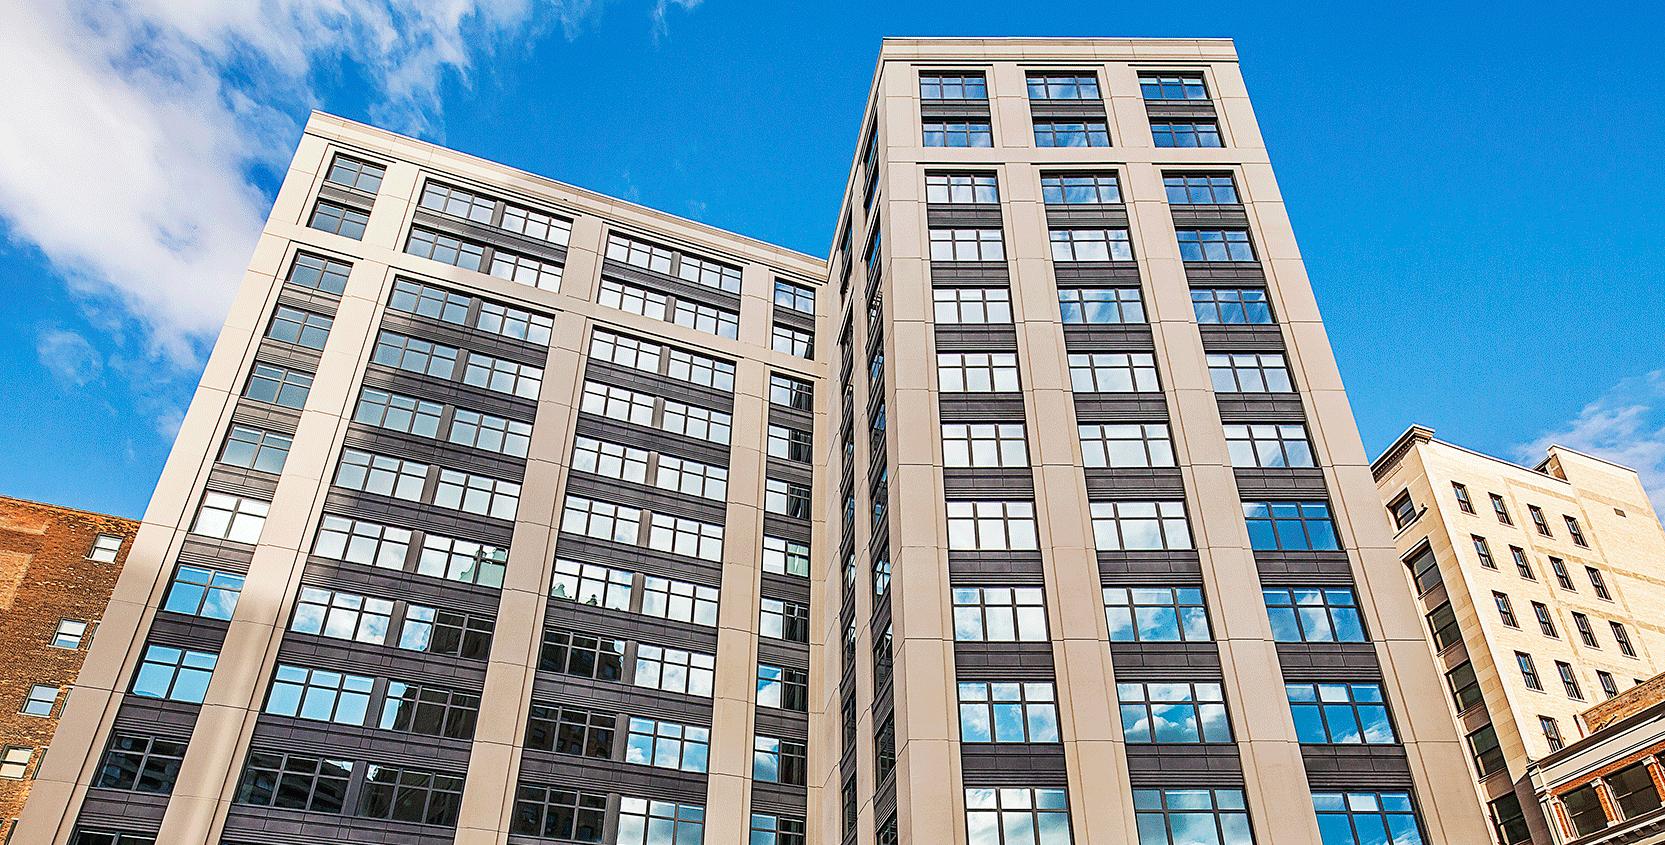 28 W Grand Lofts-Exterior-Facade-1665x845